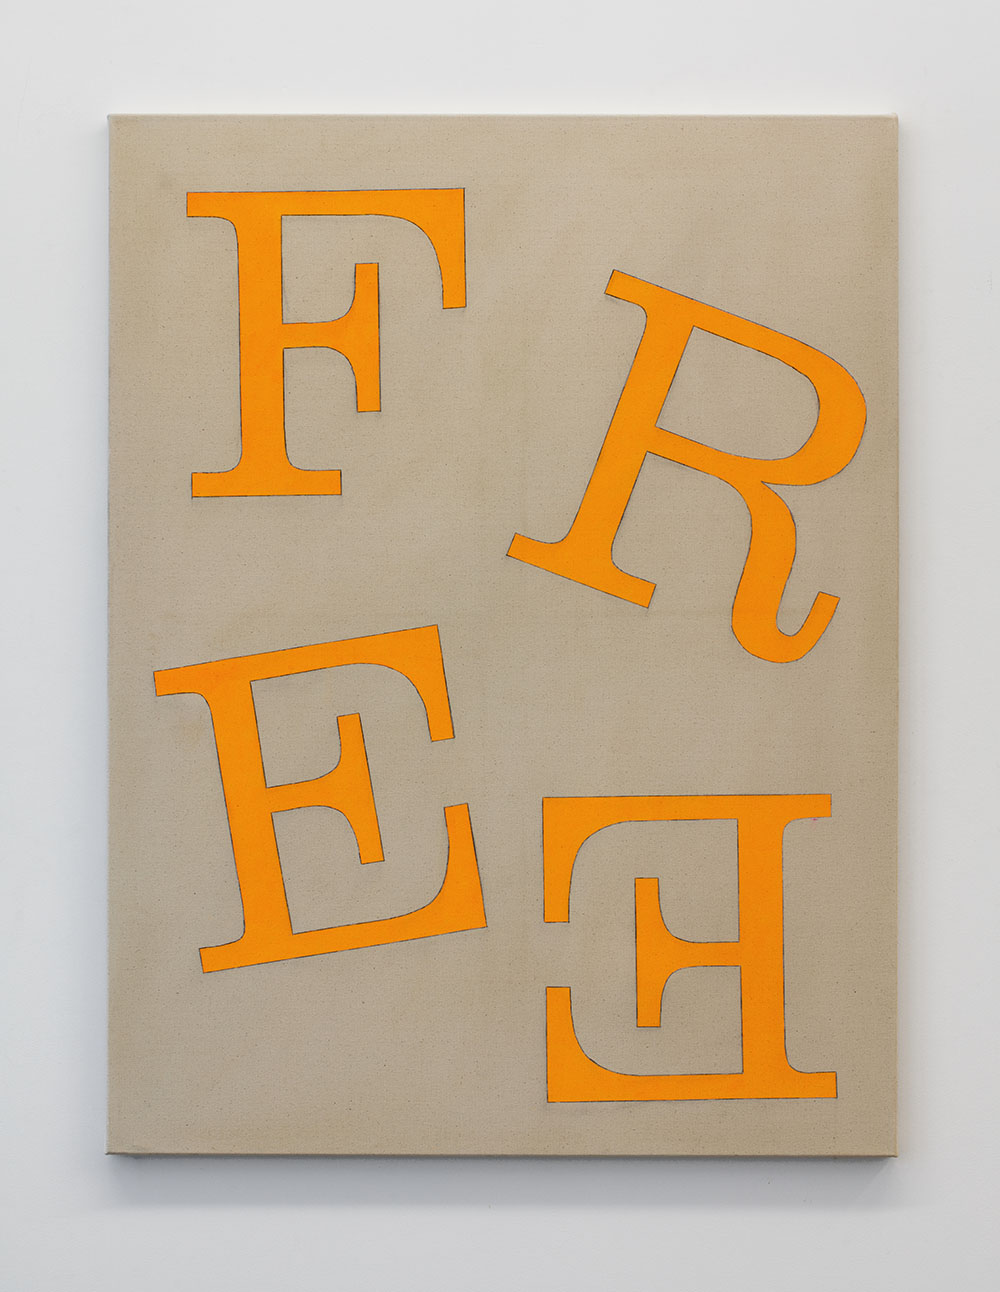 Dark beige canvas with tumbling serif letters spelling 'Free' in fluro orange